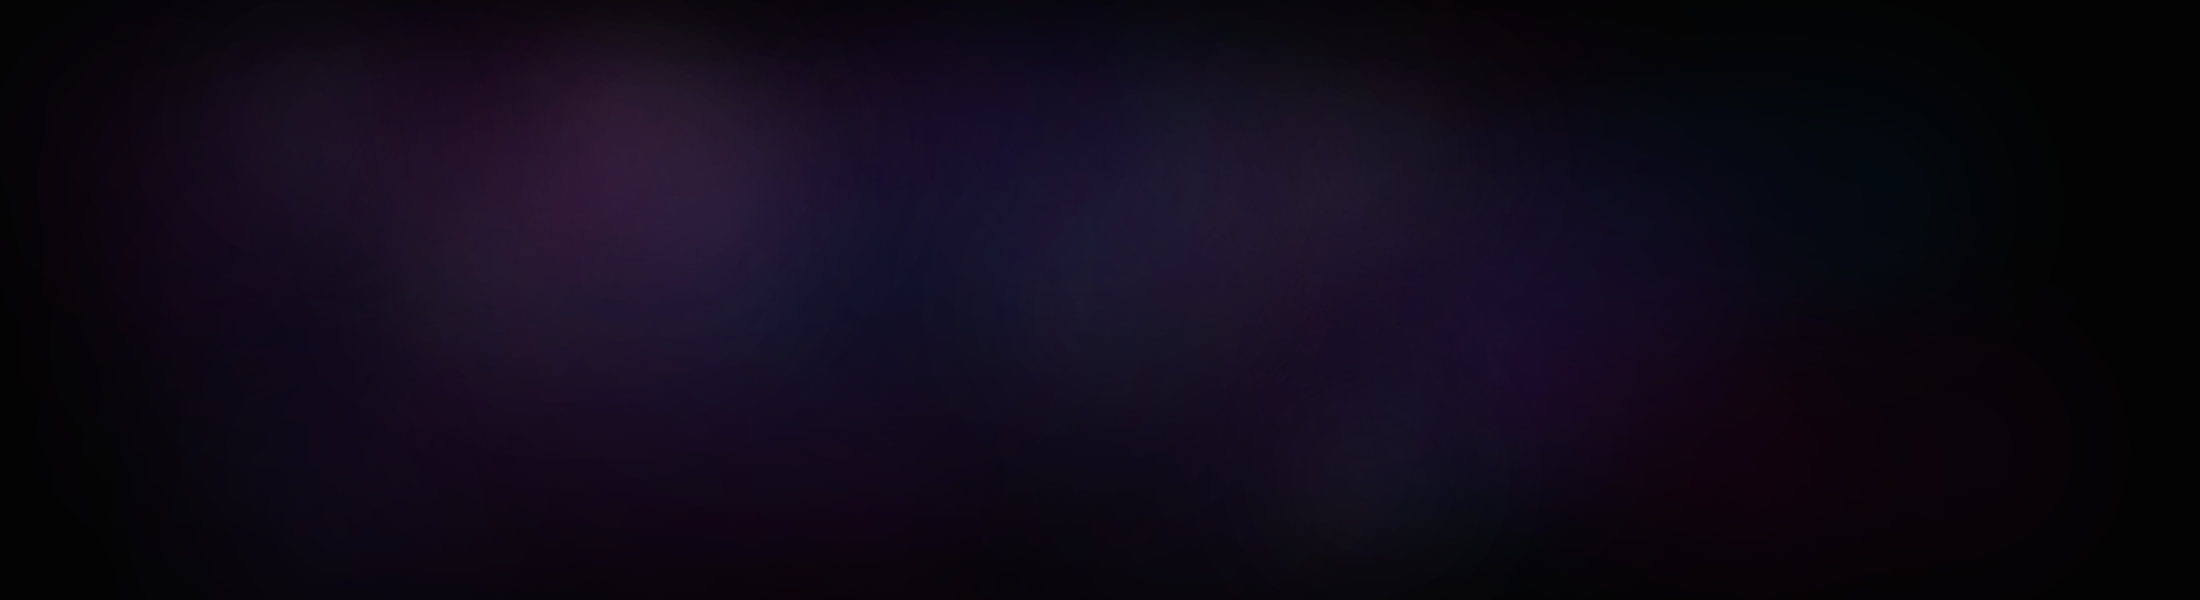 optredens-background-slider-dansstudio-la-barre